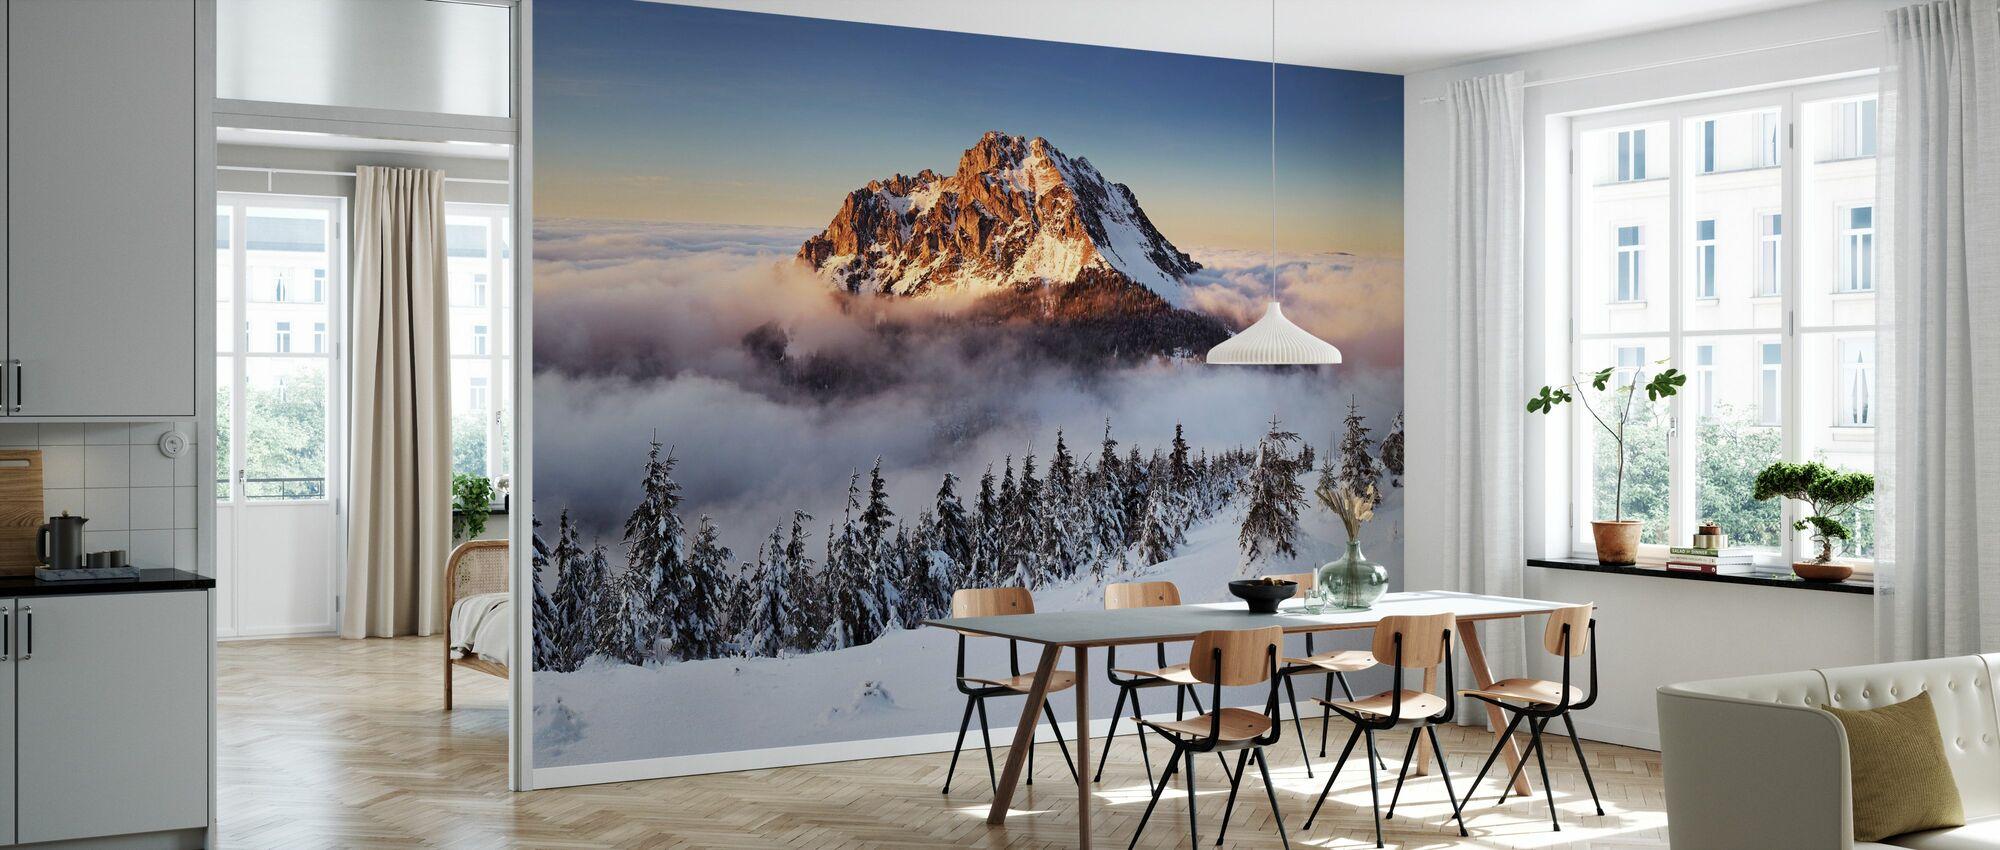 Snowy Mountain - Wallpaper - Kitchen